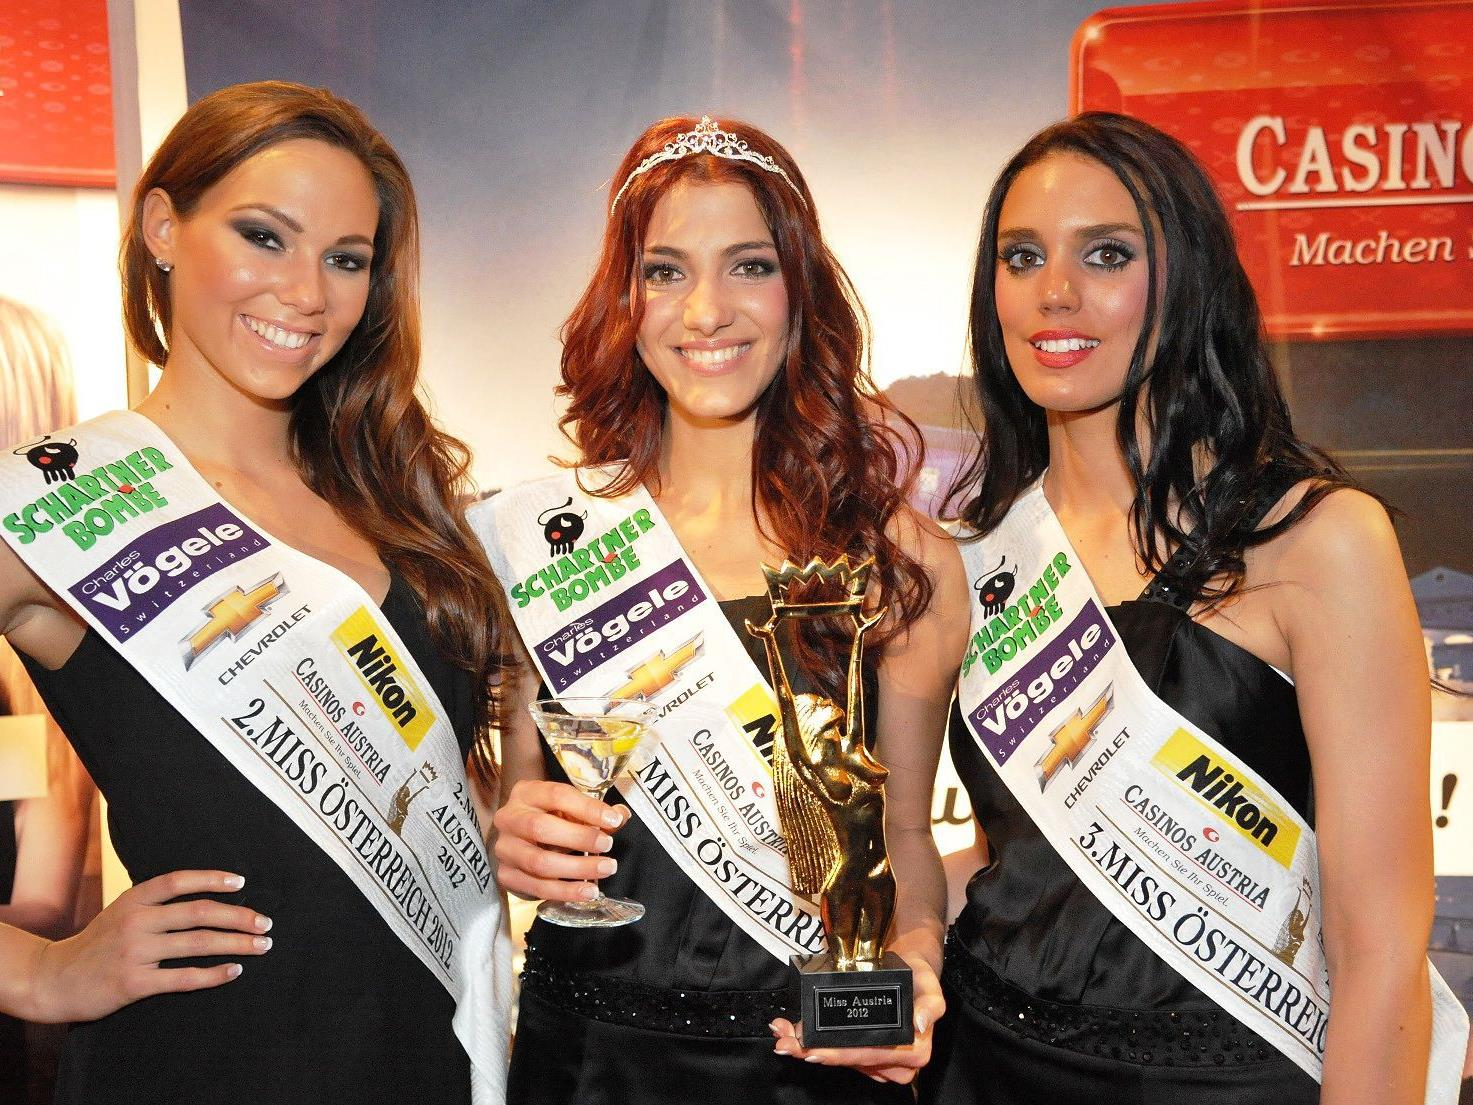 Amina Dagi wurde zur Miss Austria 2012 gekürt.